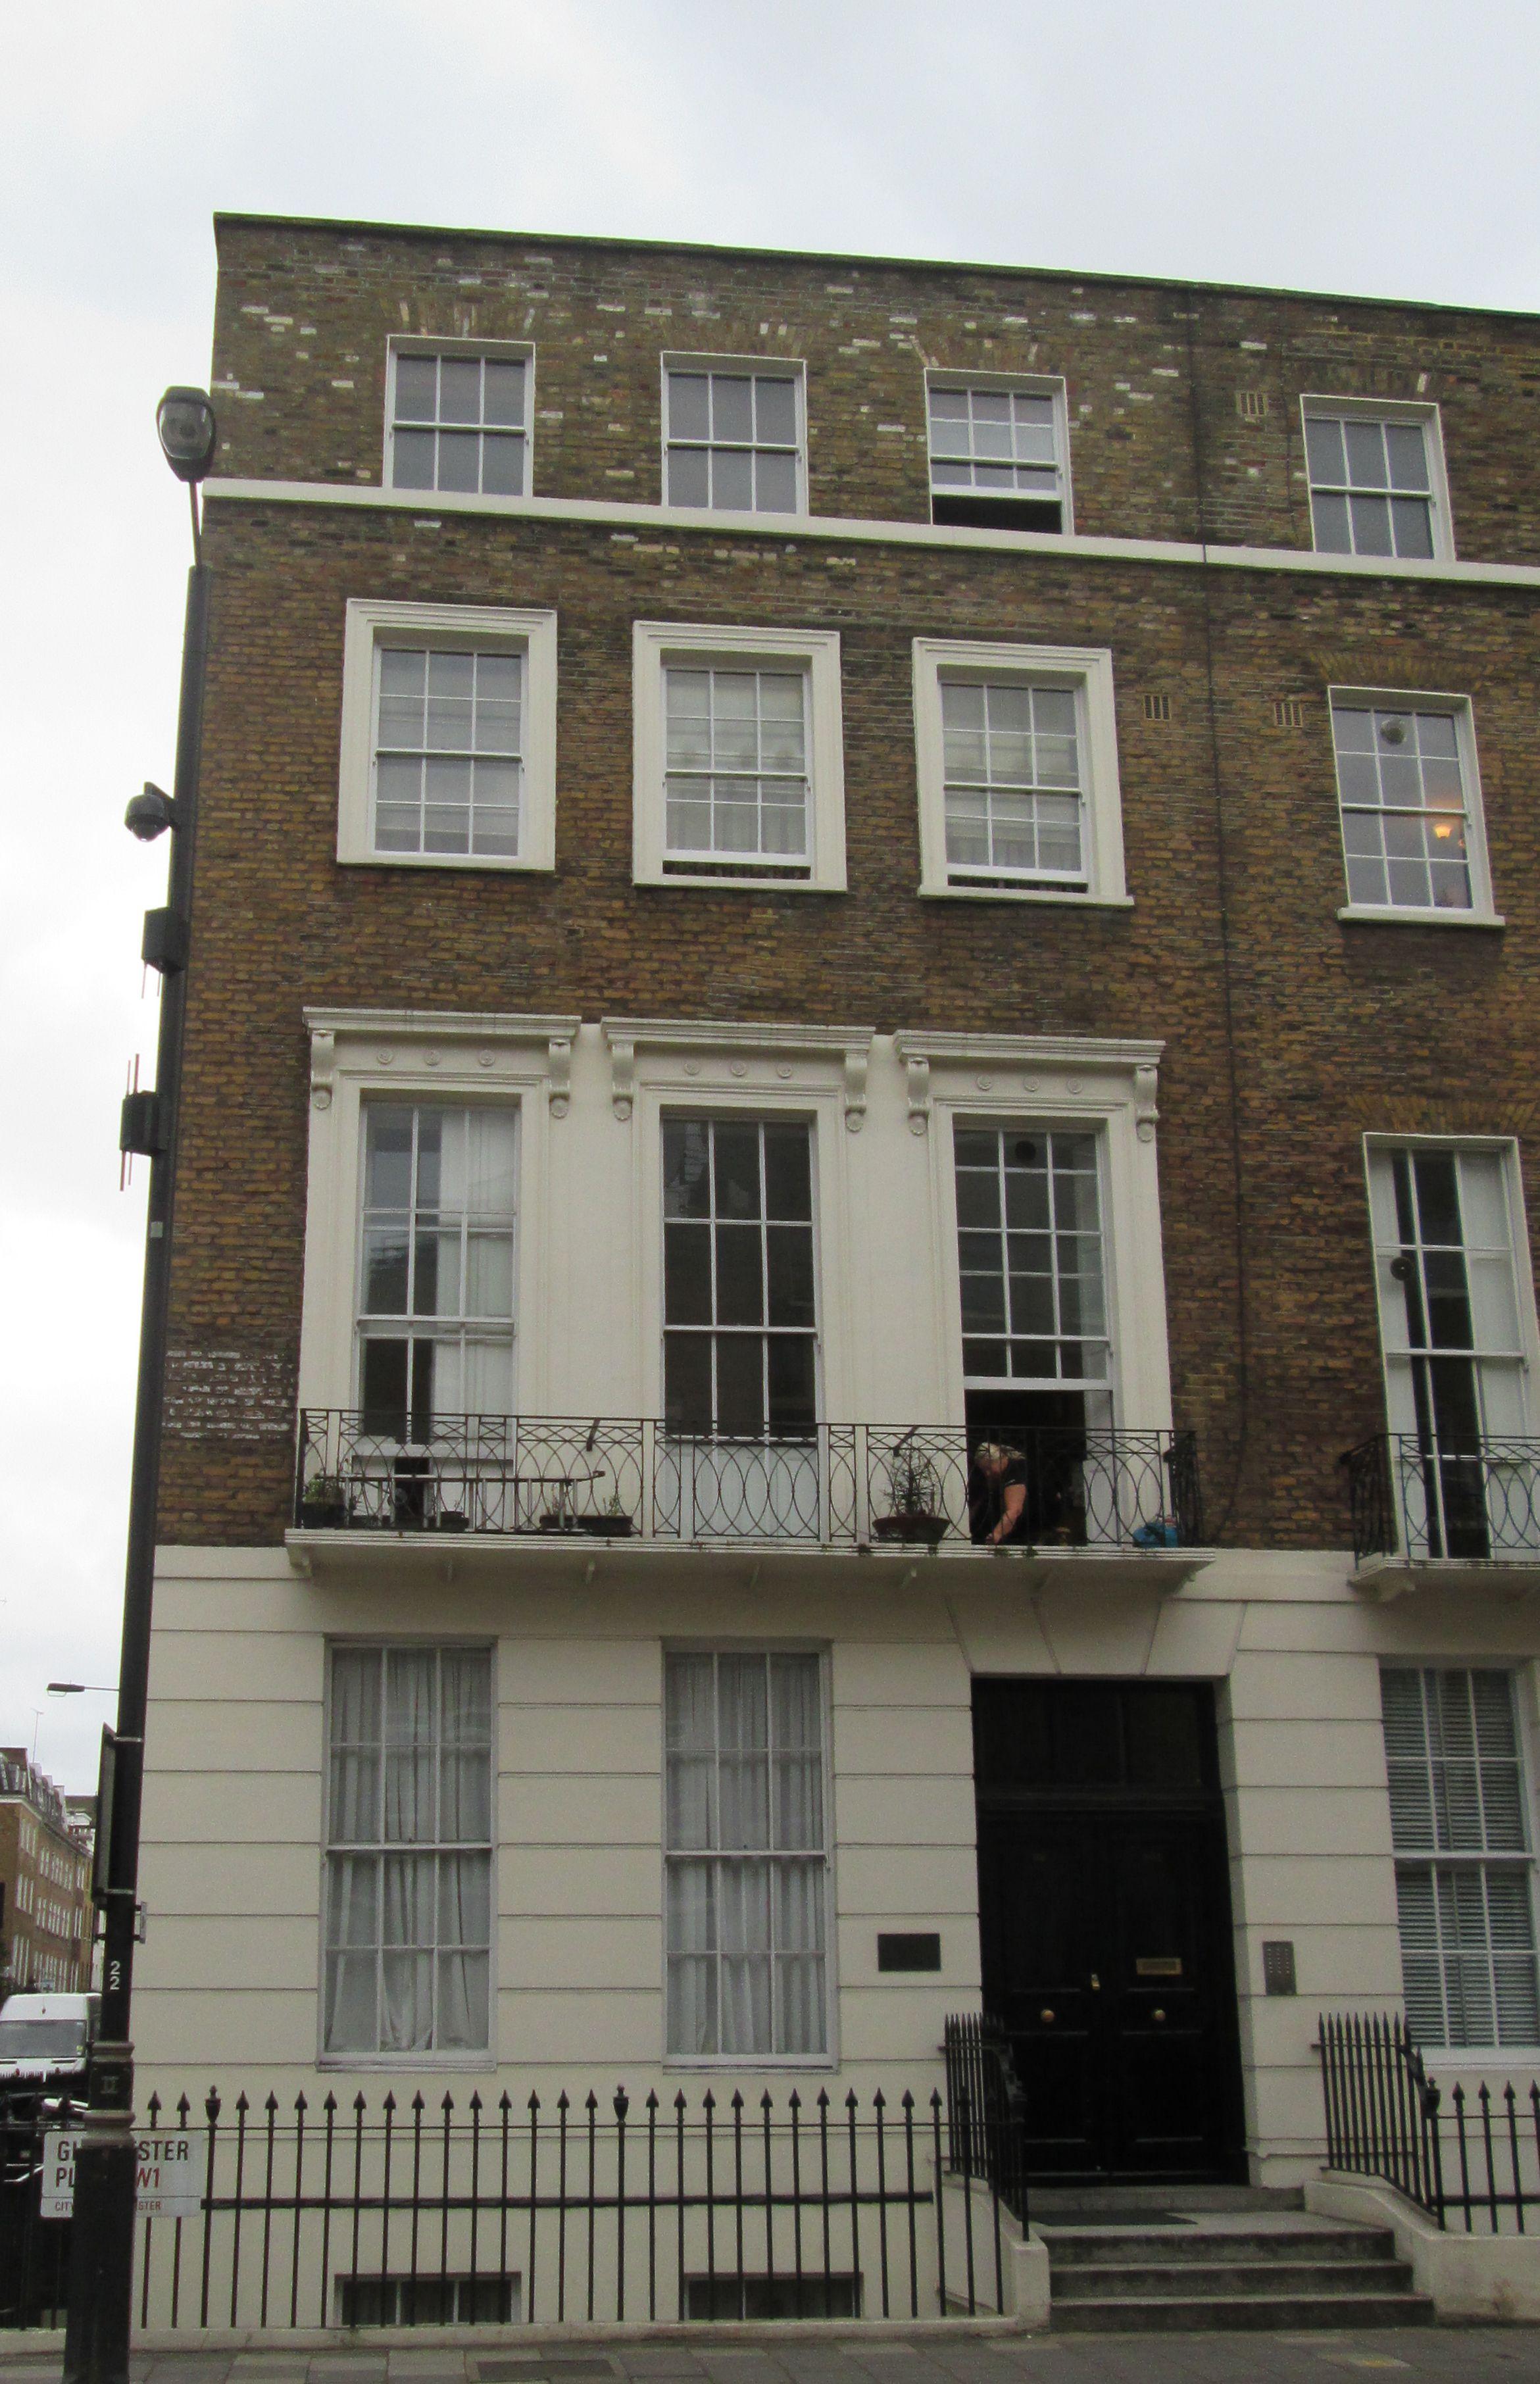 The home of Victorian poet Elizabeth Barrett Browning